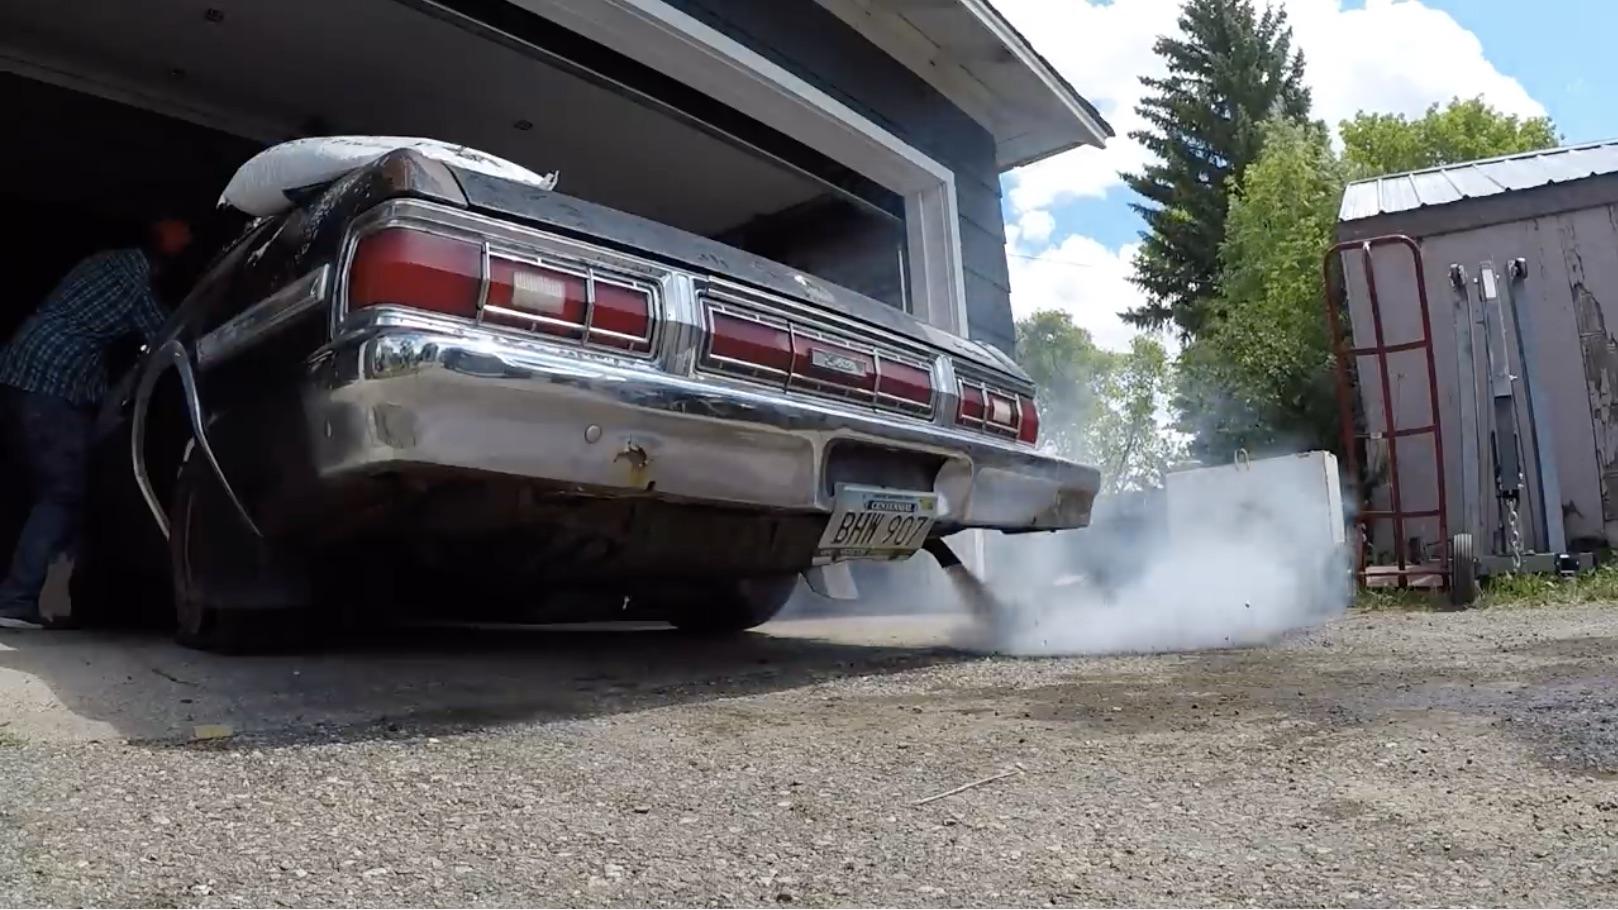 Upper Class Trash: Vice Grip Garage Wakes Up A 1975 Ford Gran Torino Elite